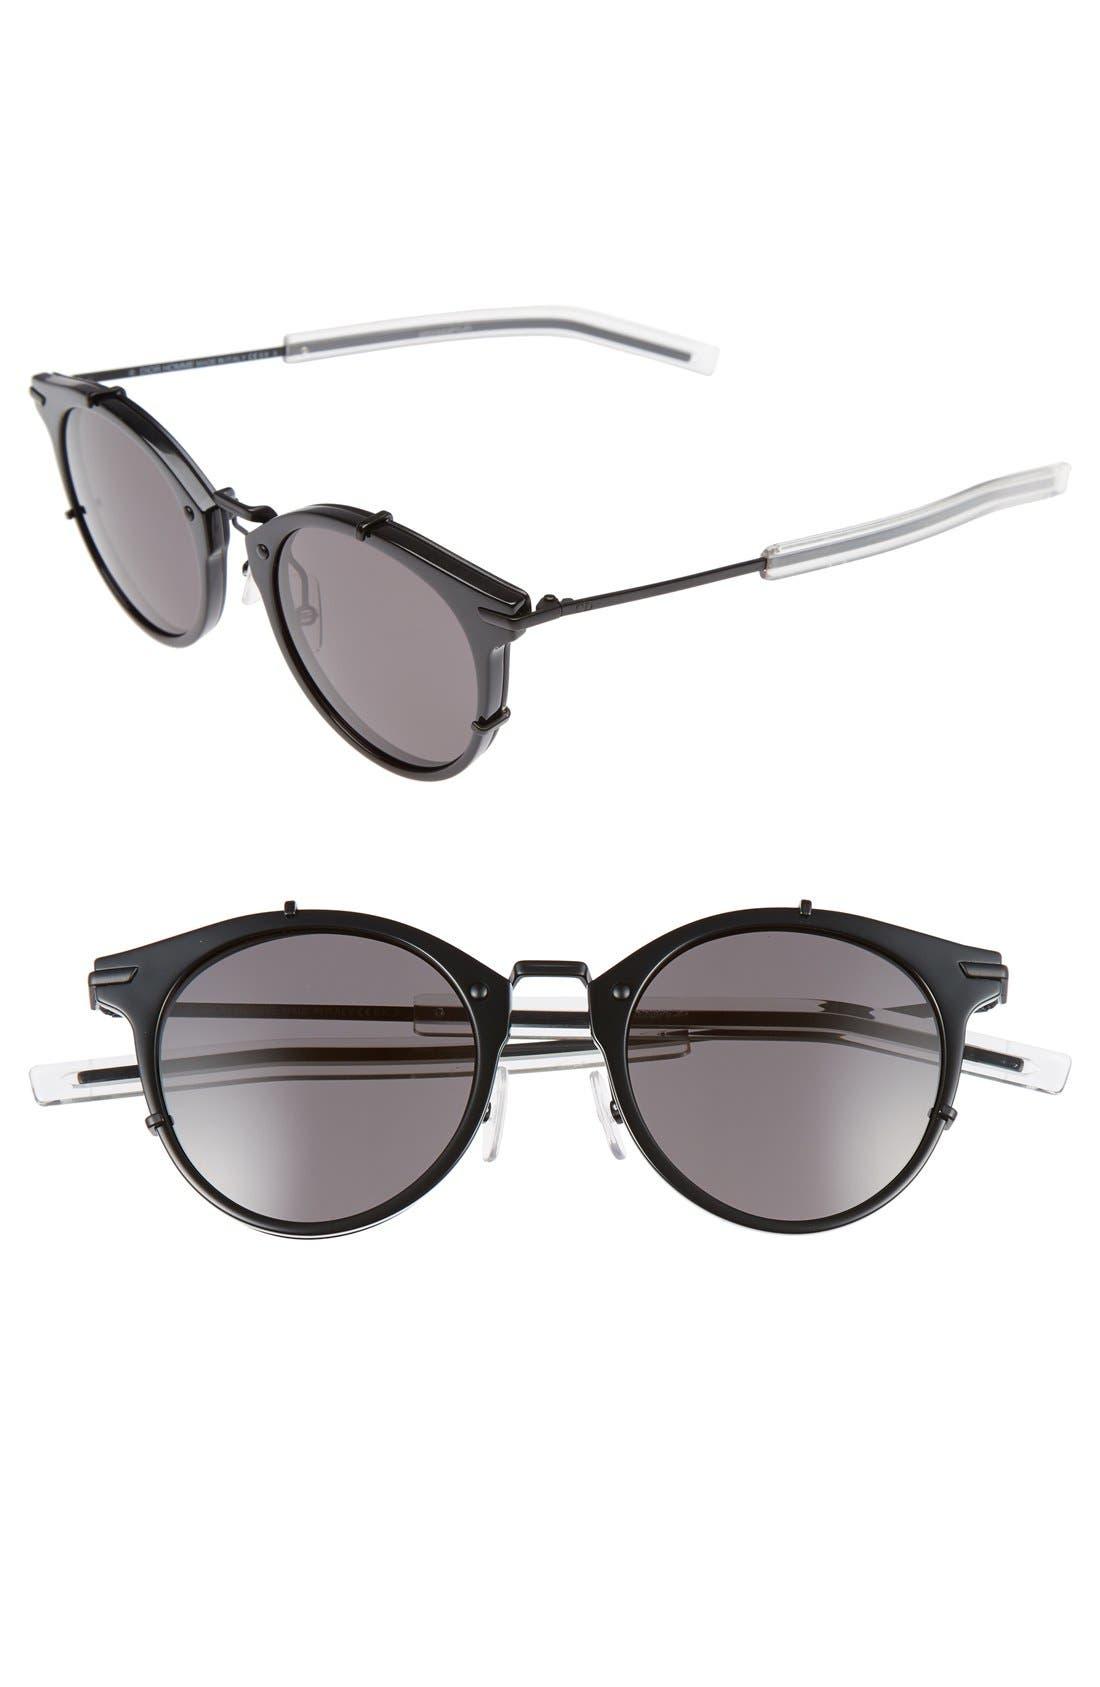 e84579c78a5 716737611982. Men s Dior Homme 48Mm Round Sunglasses - Shiny Matte Black